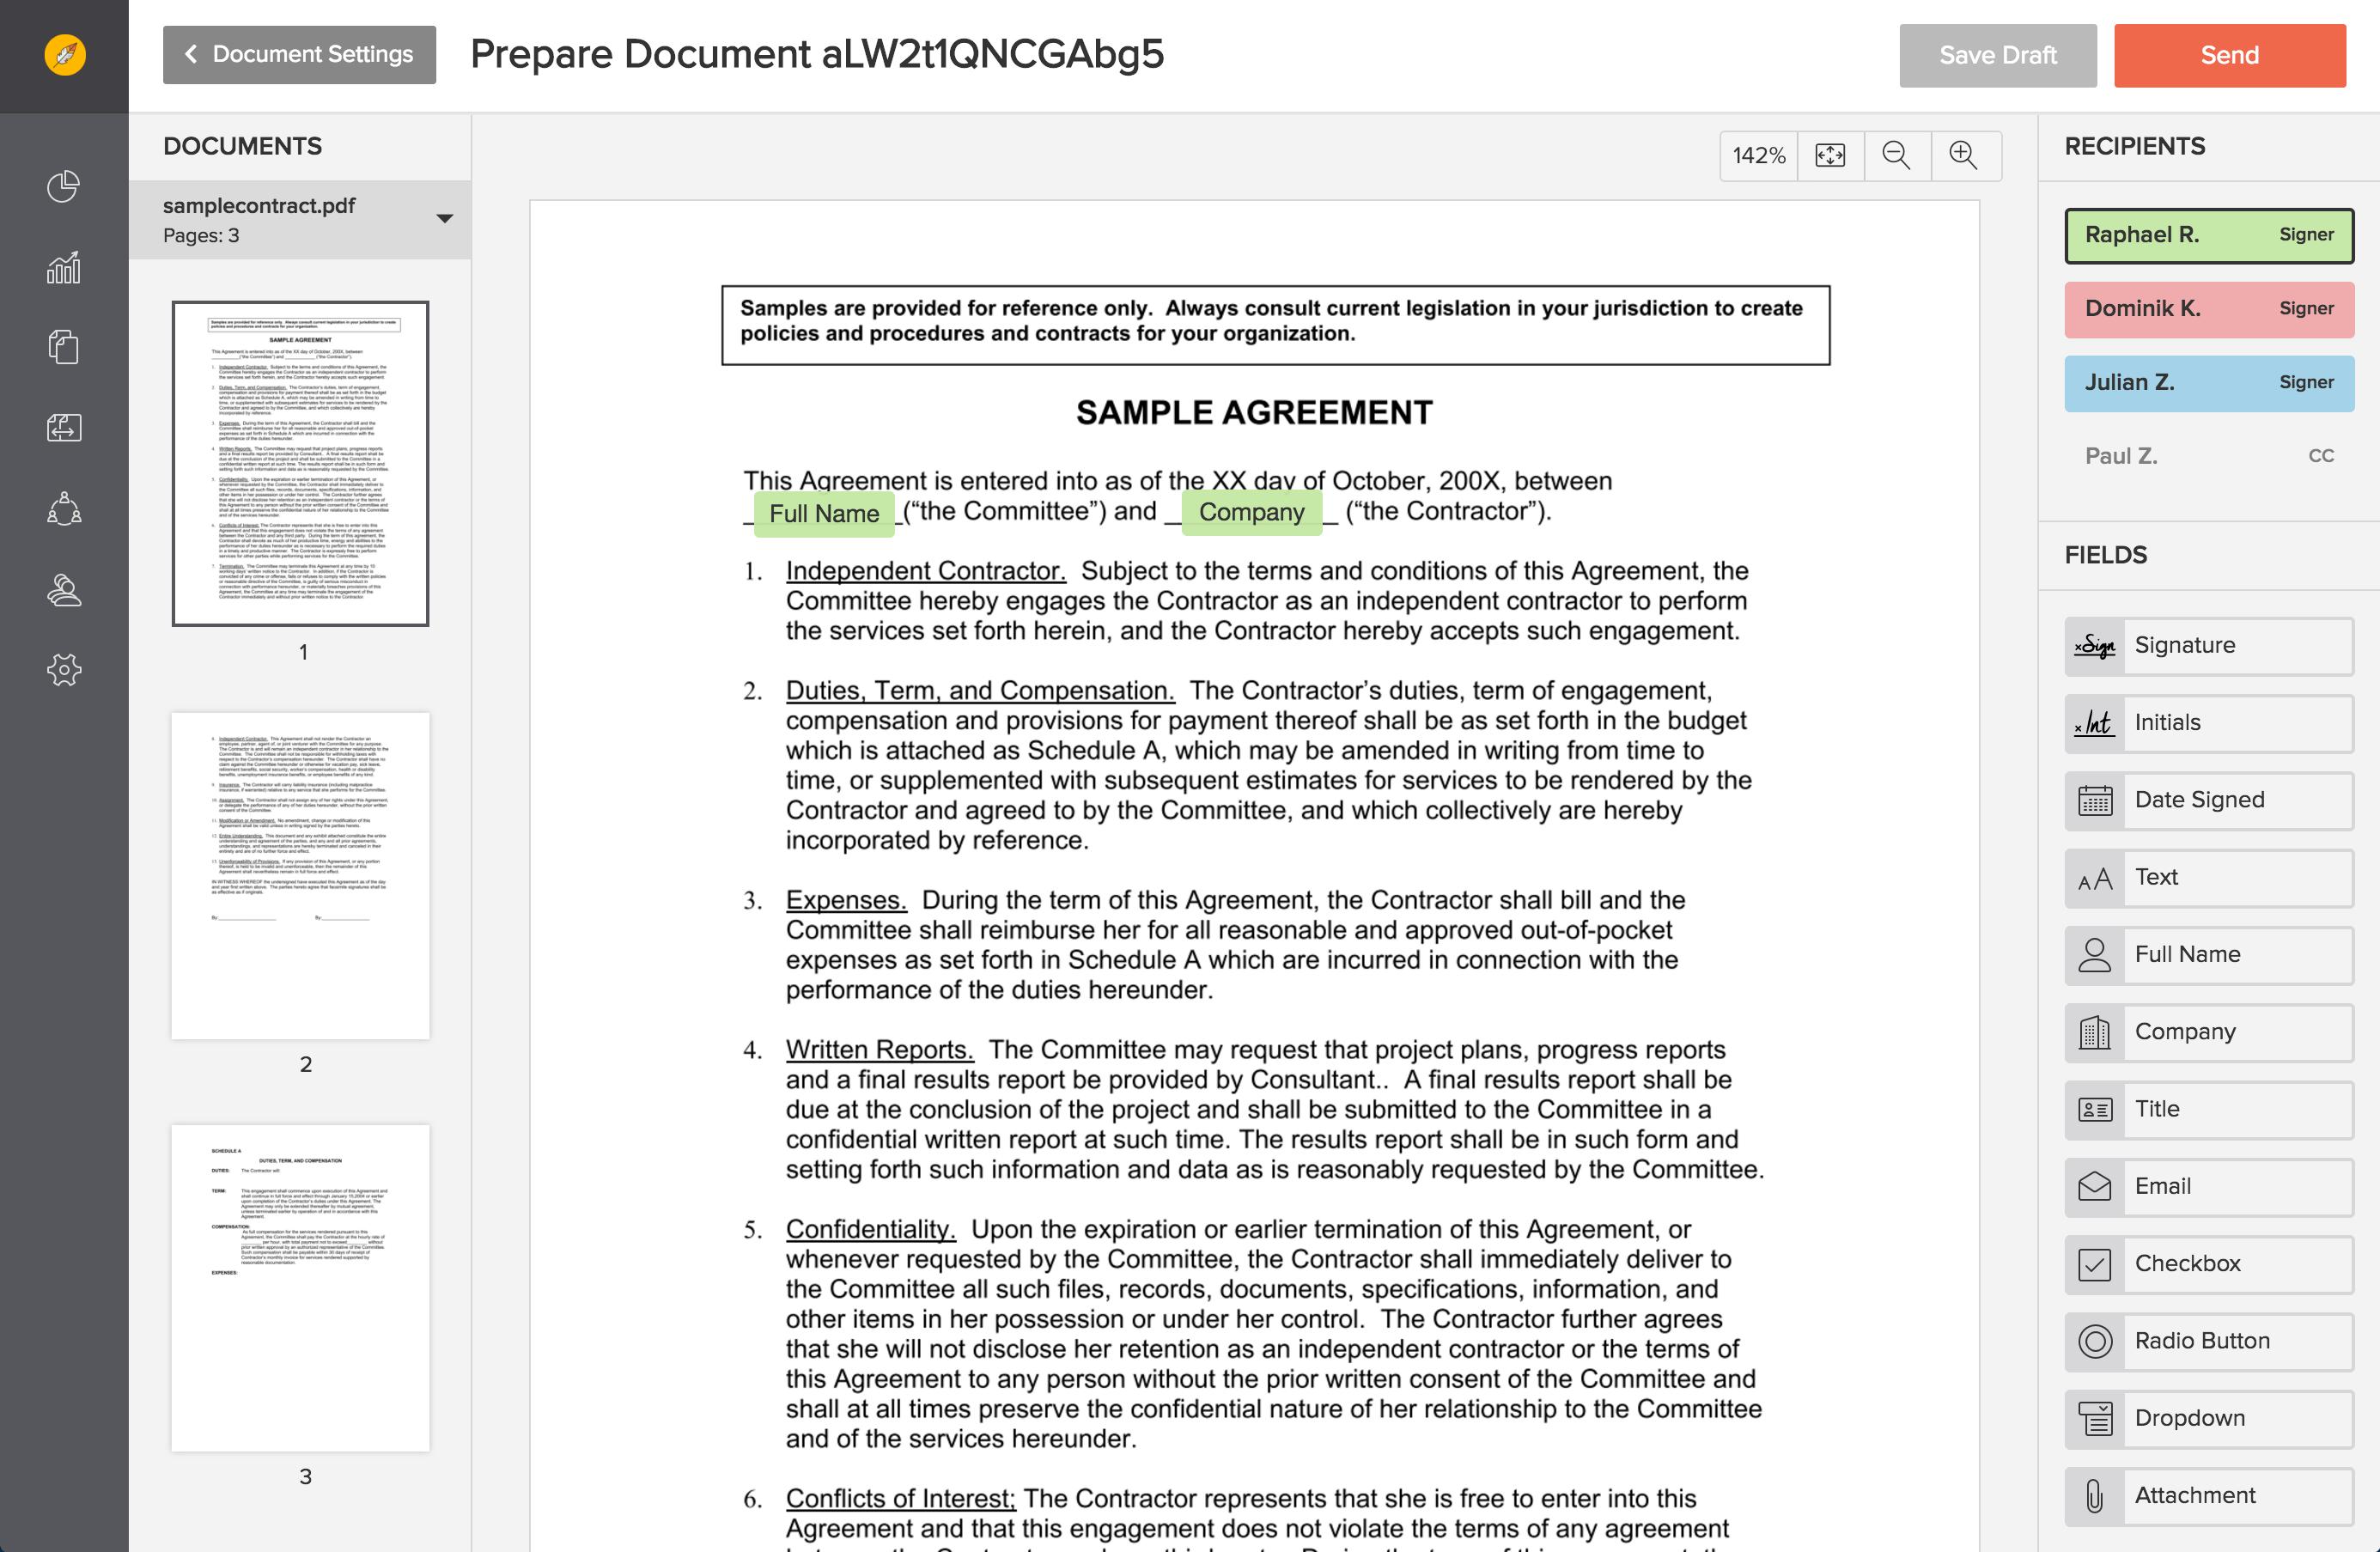 free pdf editor upload document